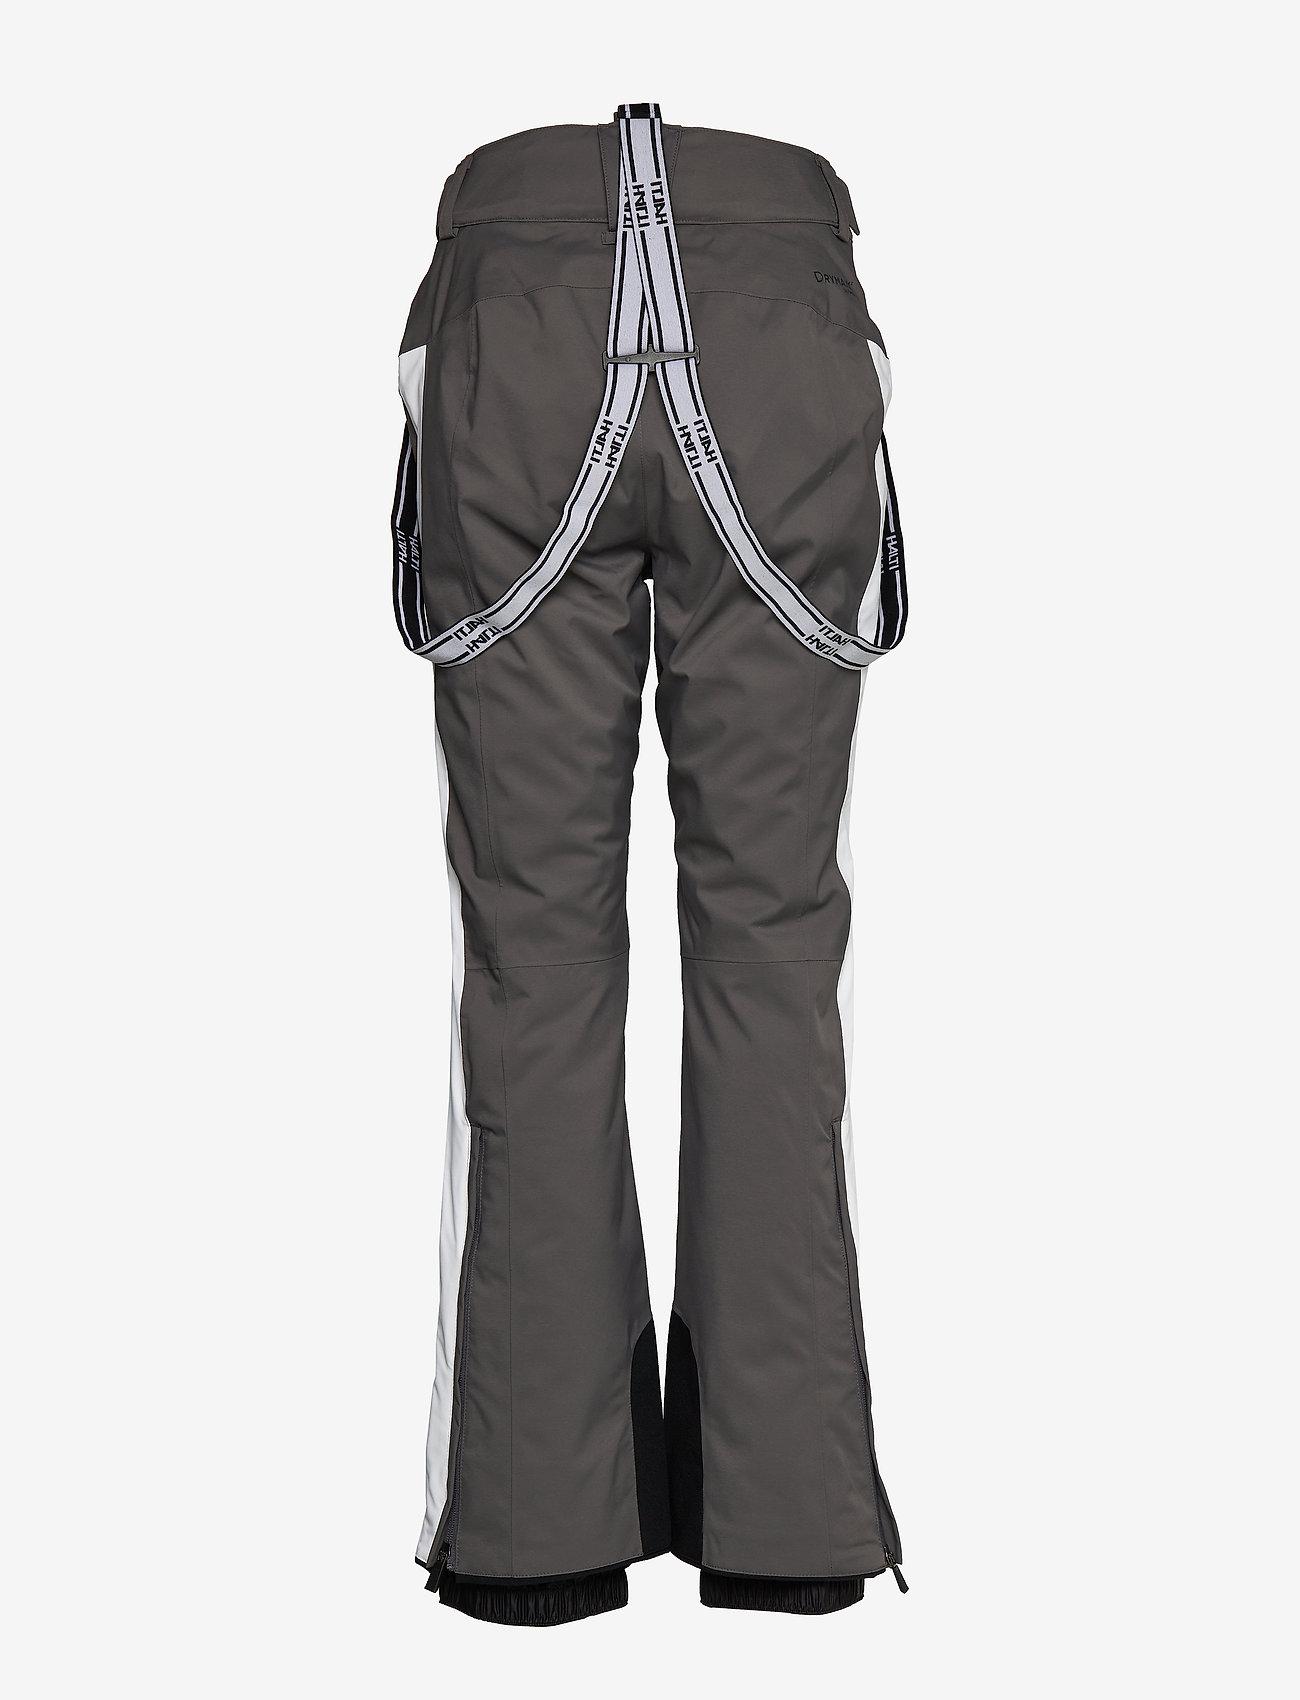 Halti - Podium Women's DX Ski Pants - insulated pants - granite grey - 1